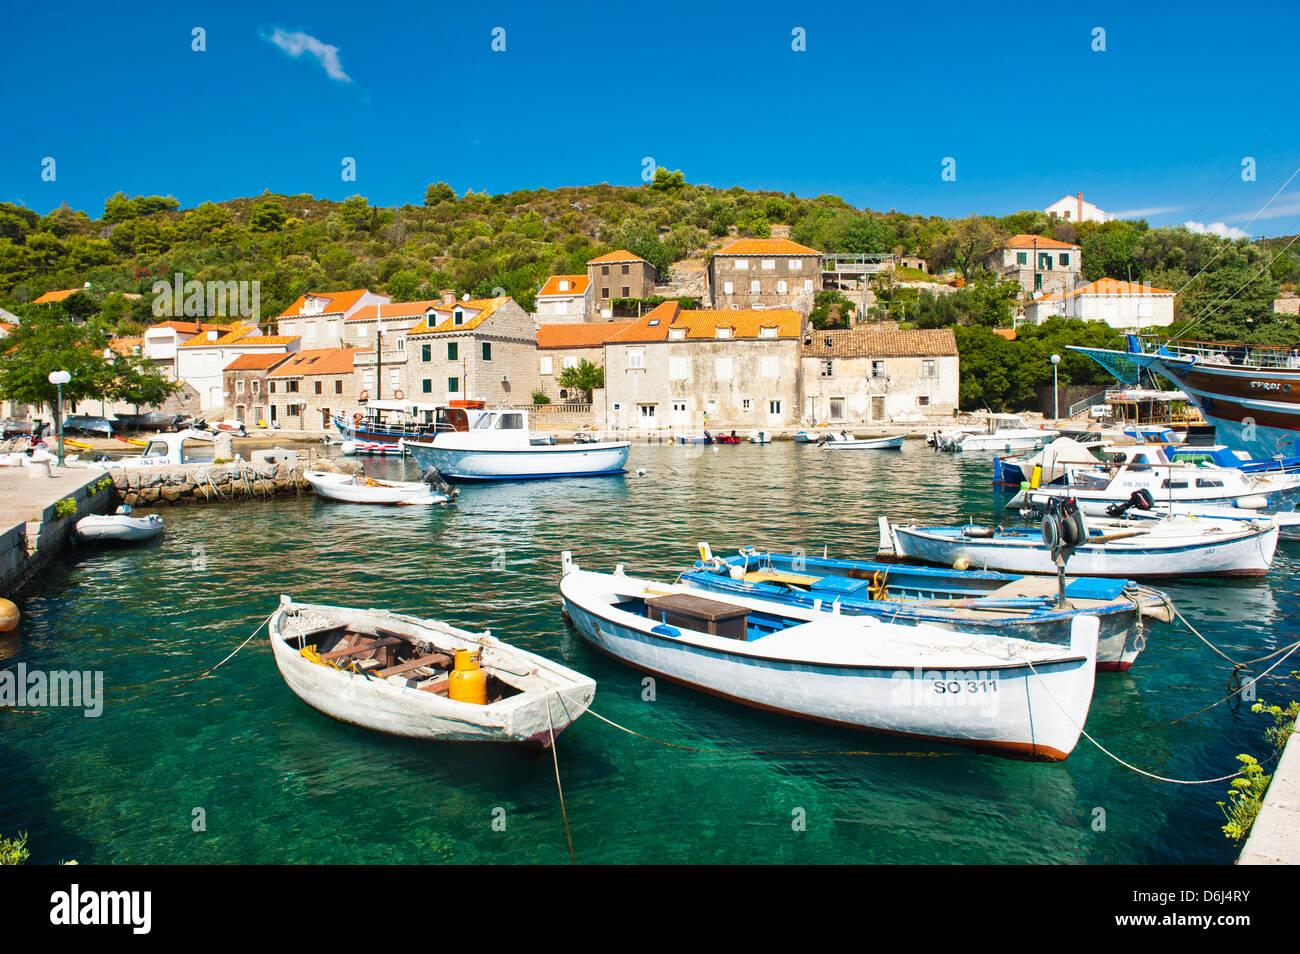 Boats in the port, Sipan Island, Elaphiti Islands, Dalmatian Coast, Adriatic, Croatia, Europe - Stock Image